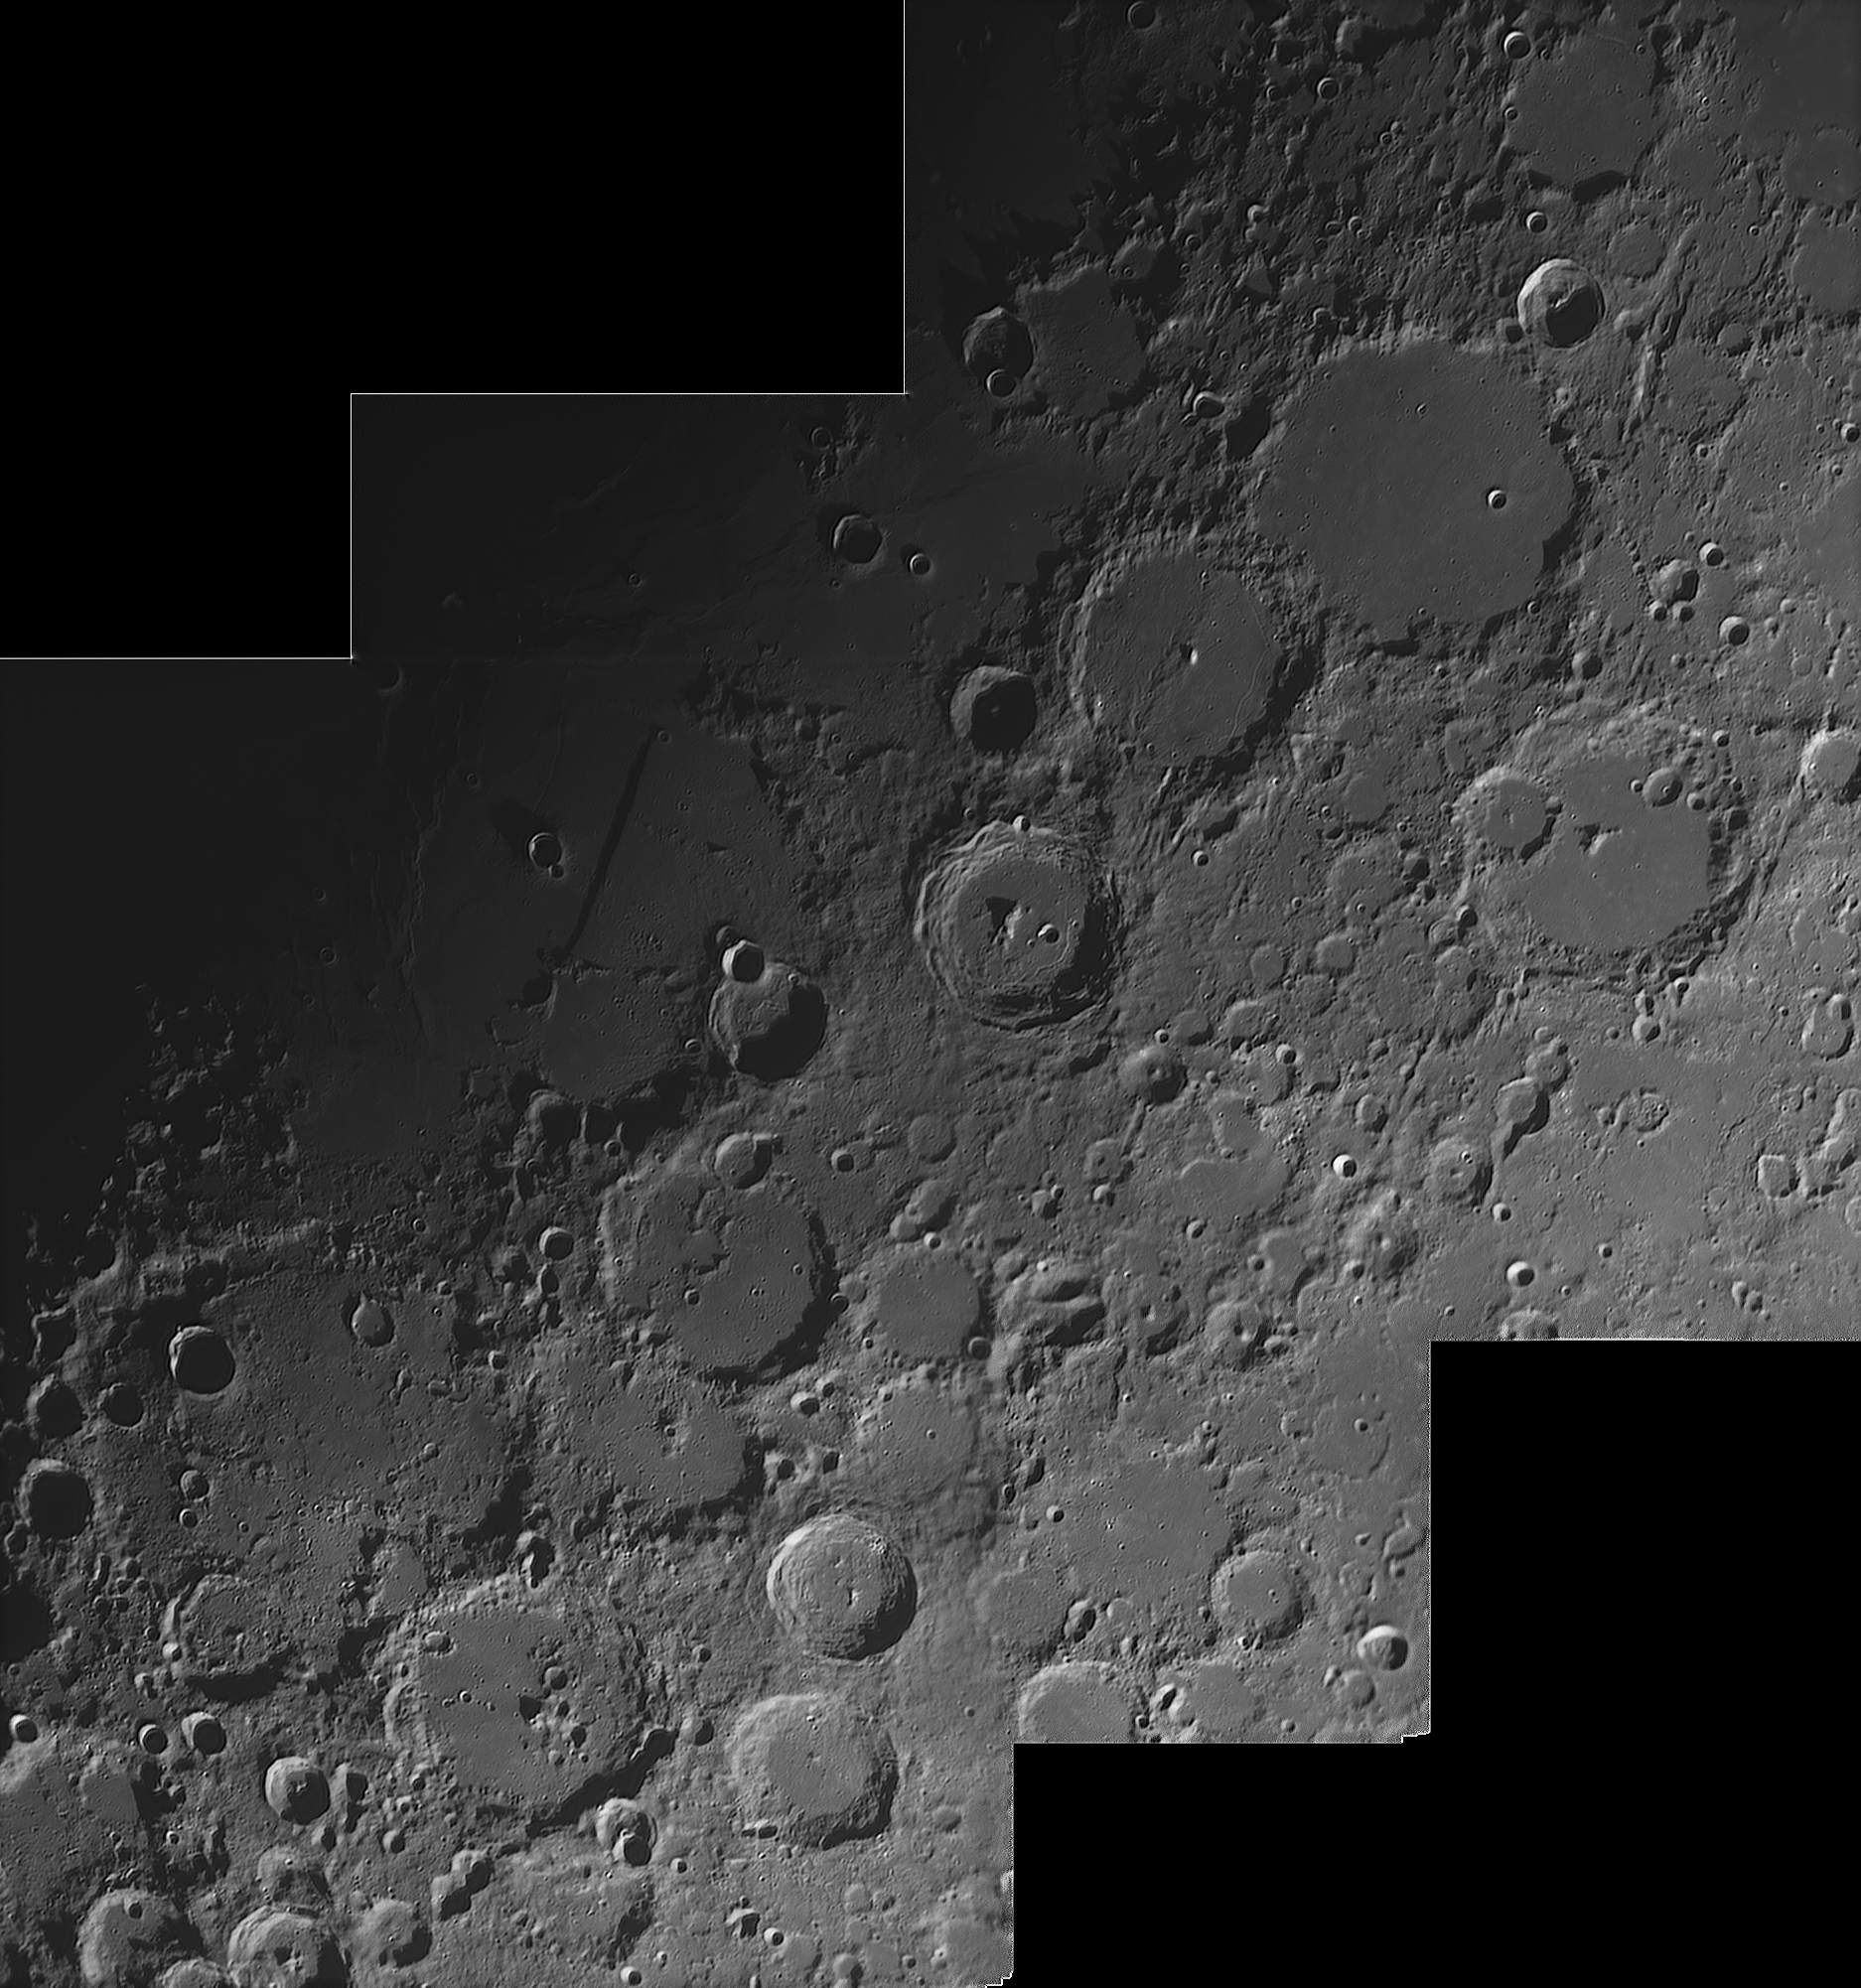 Lune-Plouchart-02.jpg